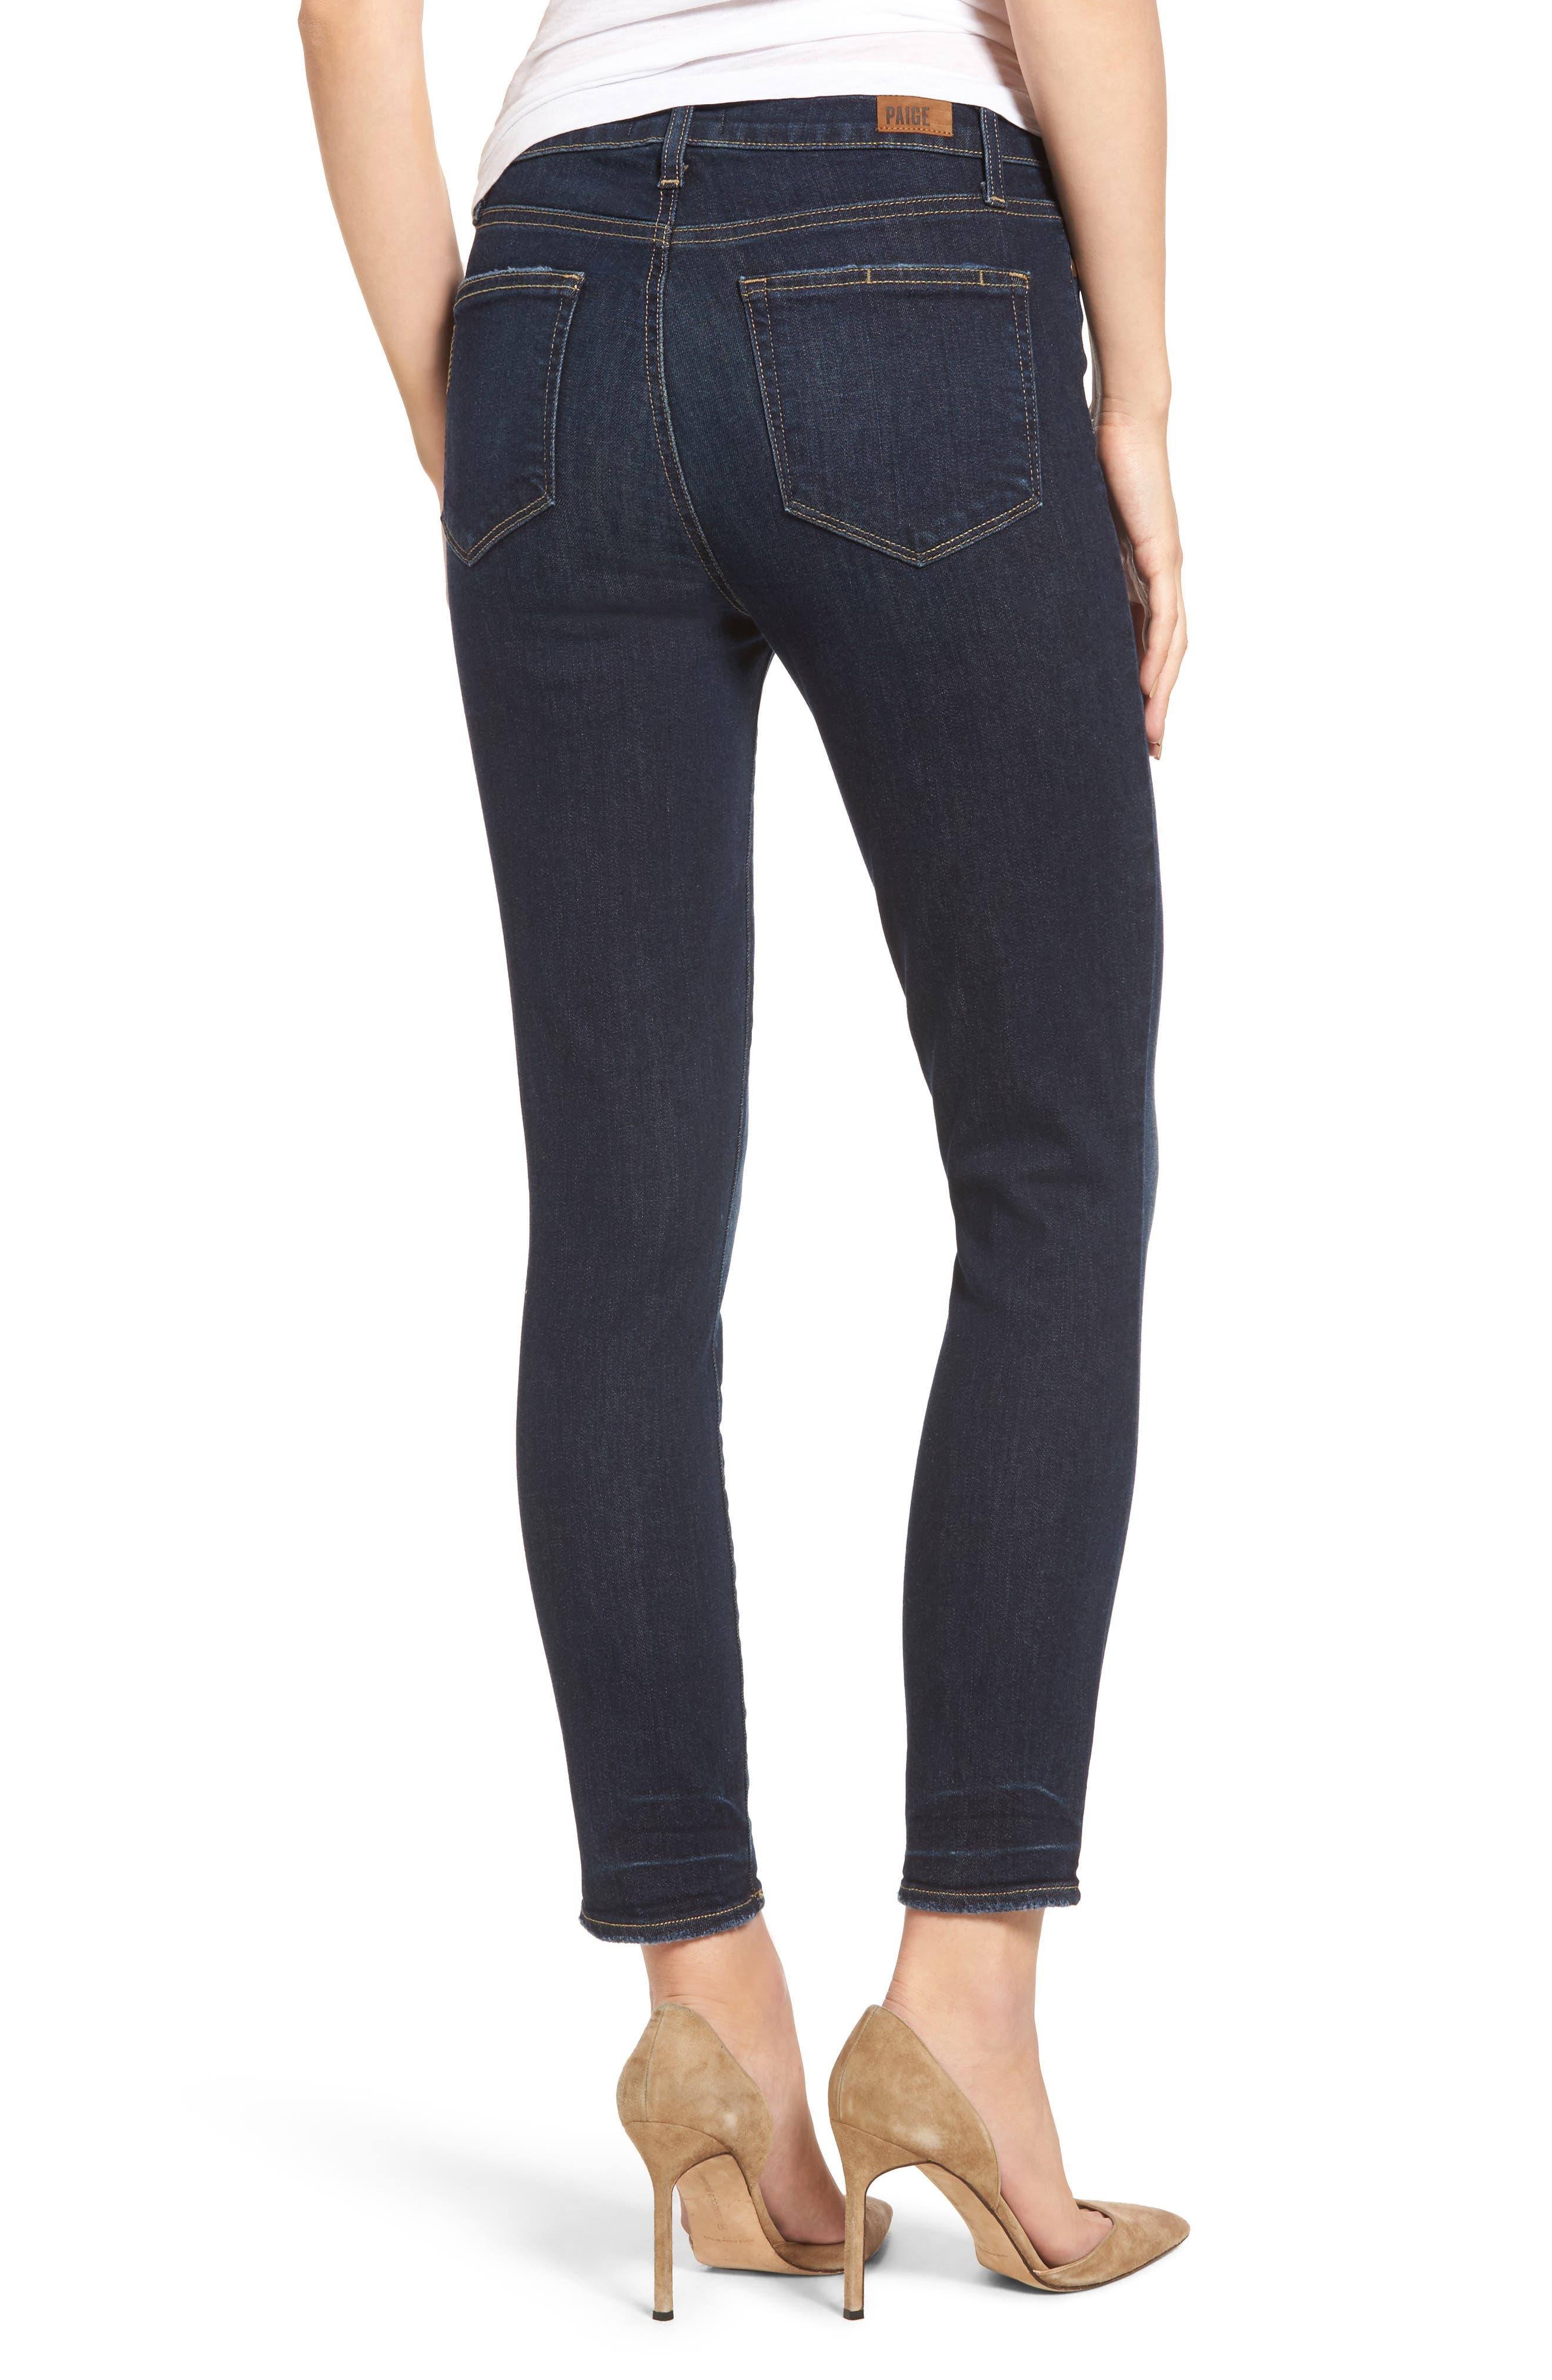 Hoxton Crop High Waist Skinny Jeans,                             Alternate thumbnail 2, color,                             400